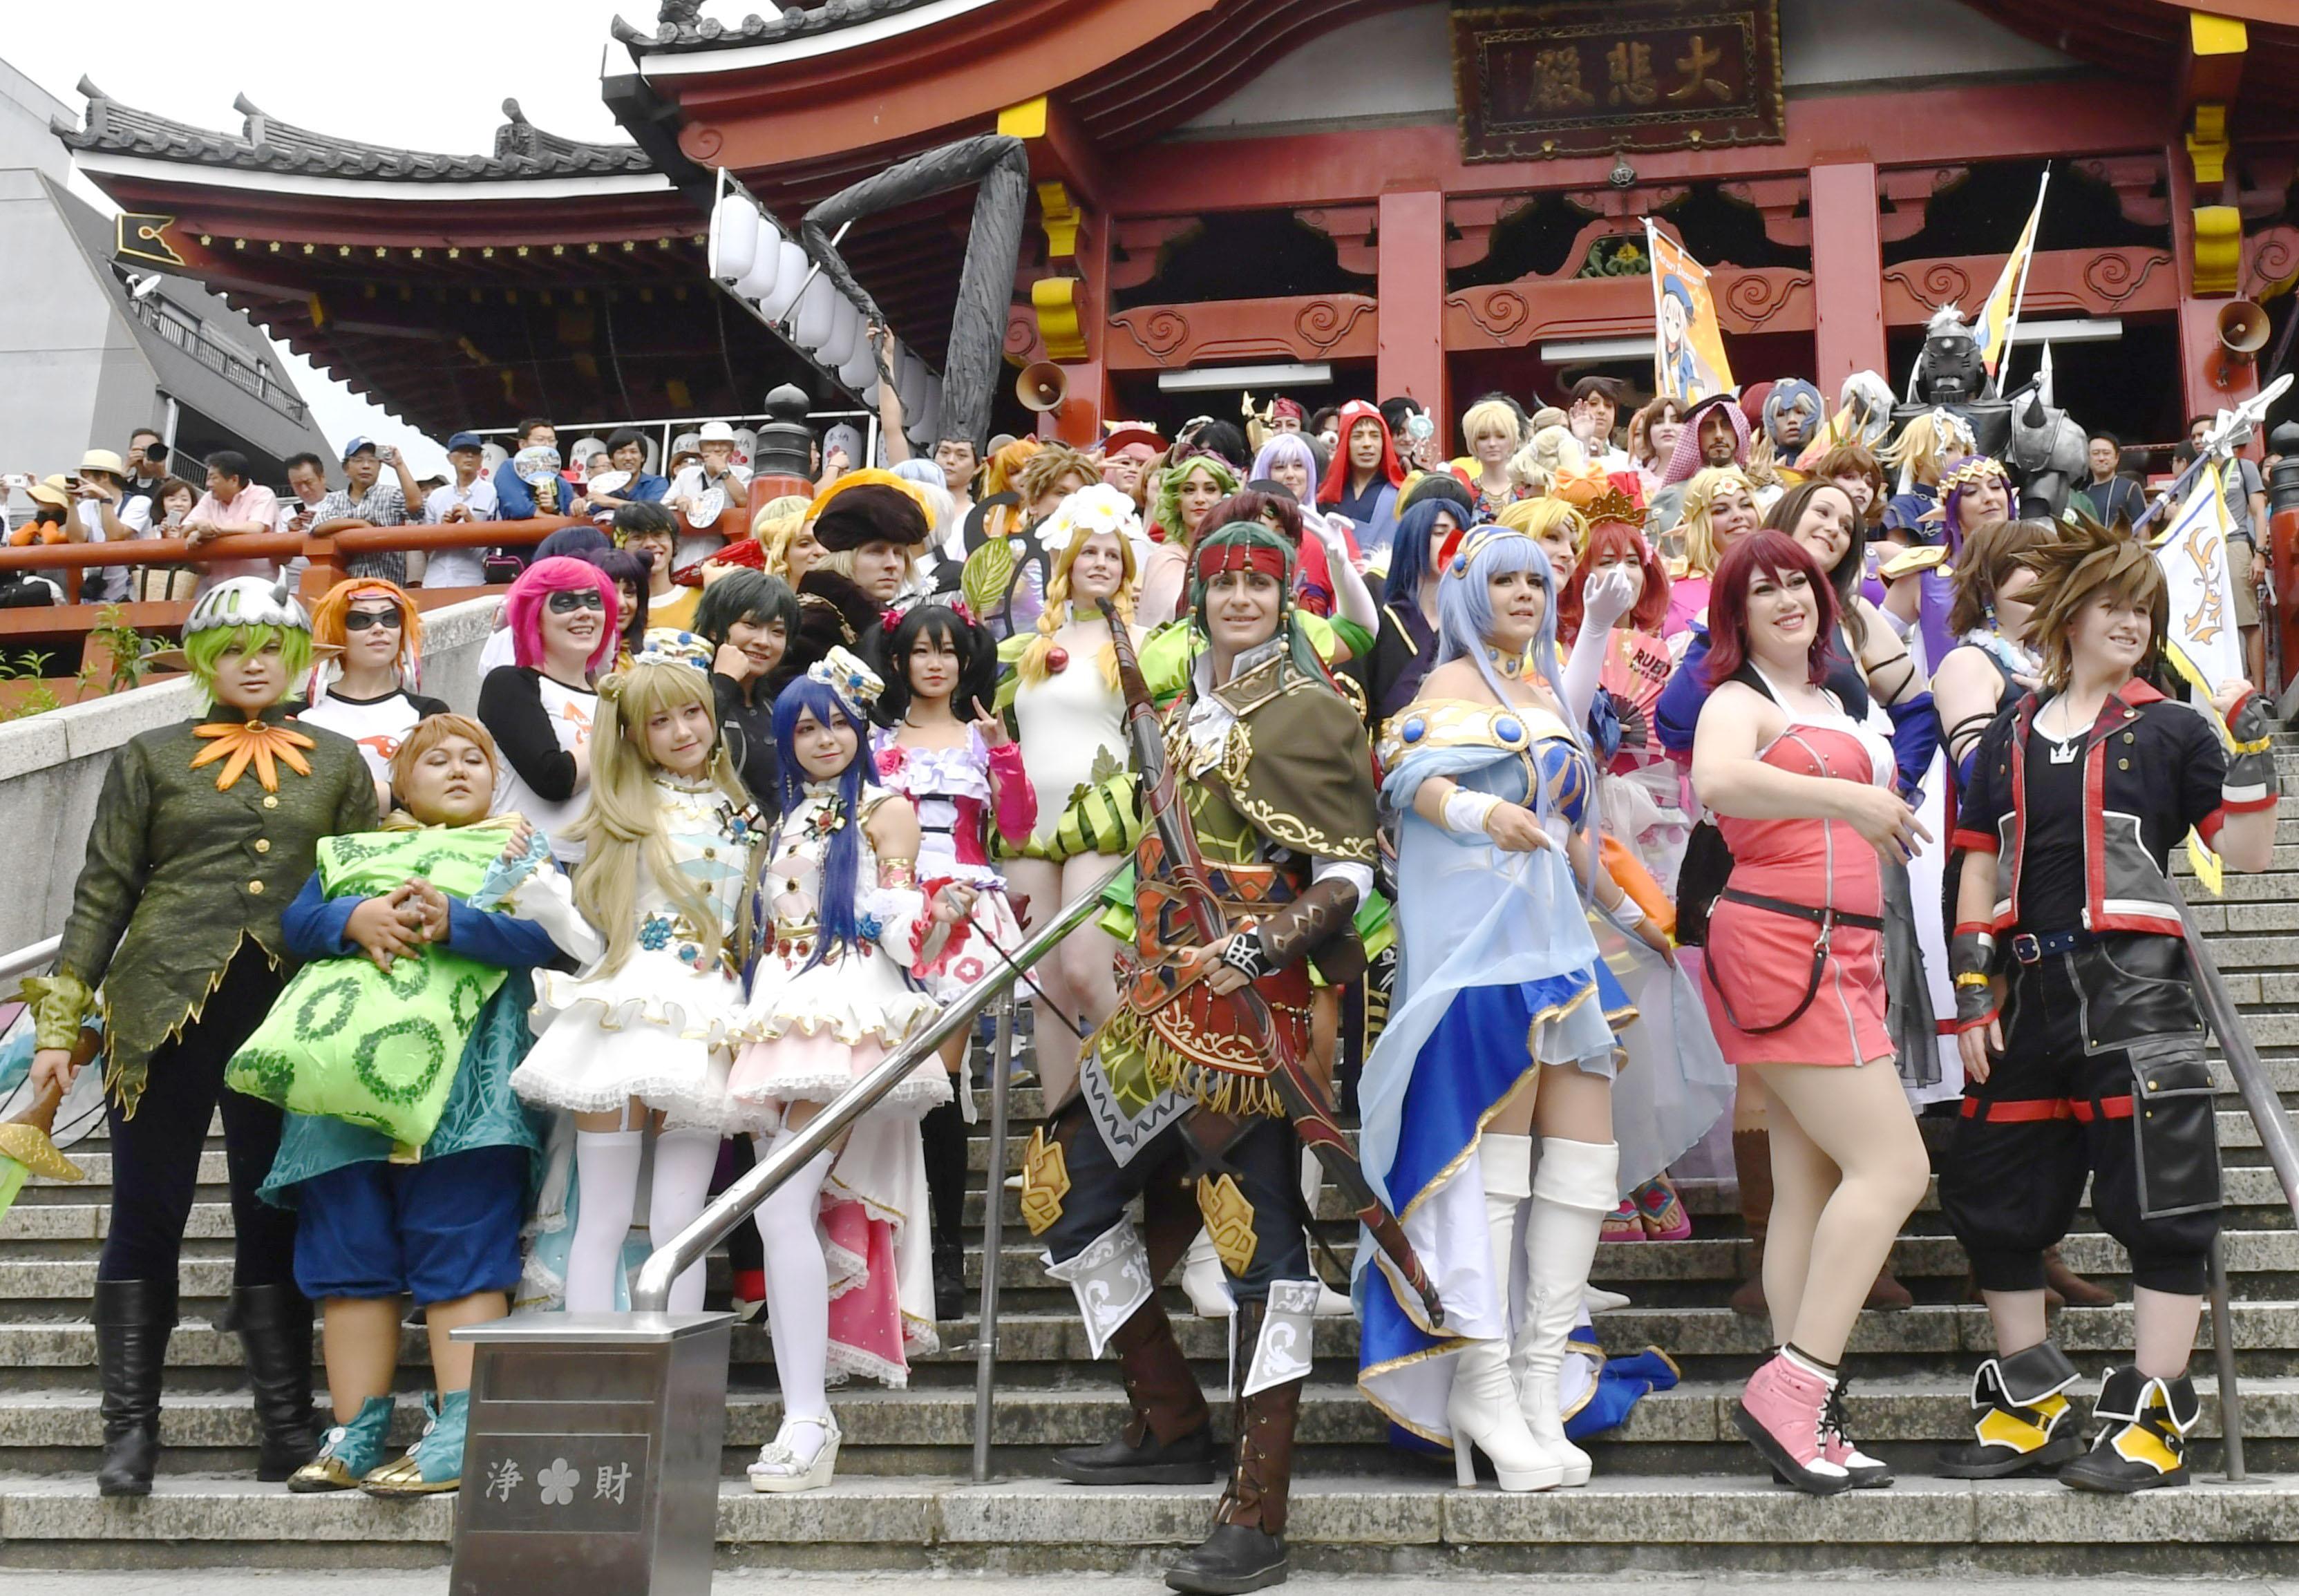 GALLERY: World Cosplay Summit in Japan